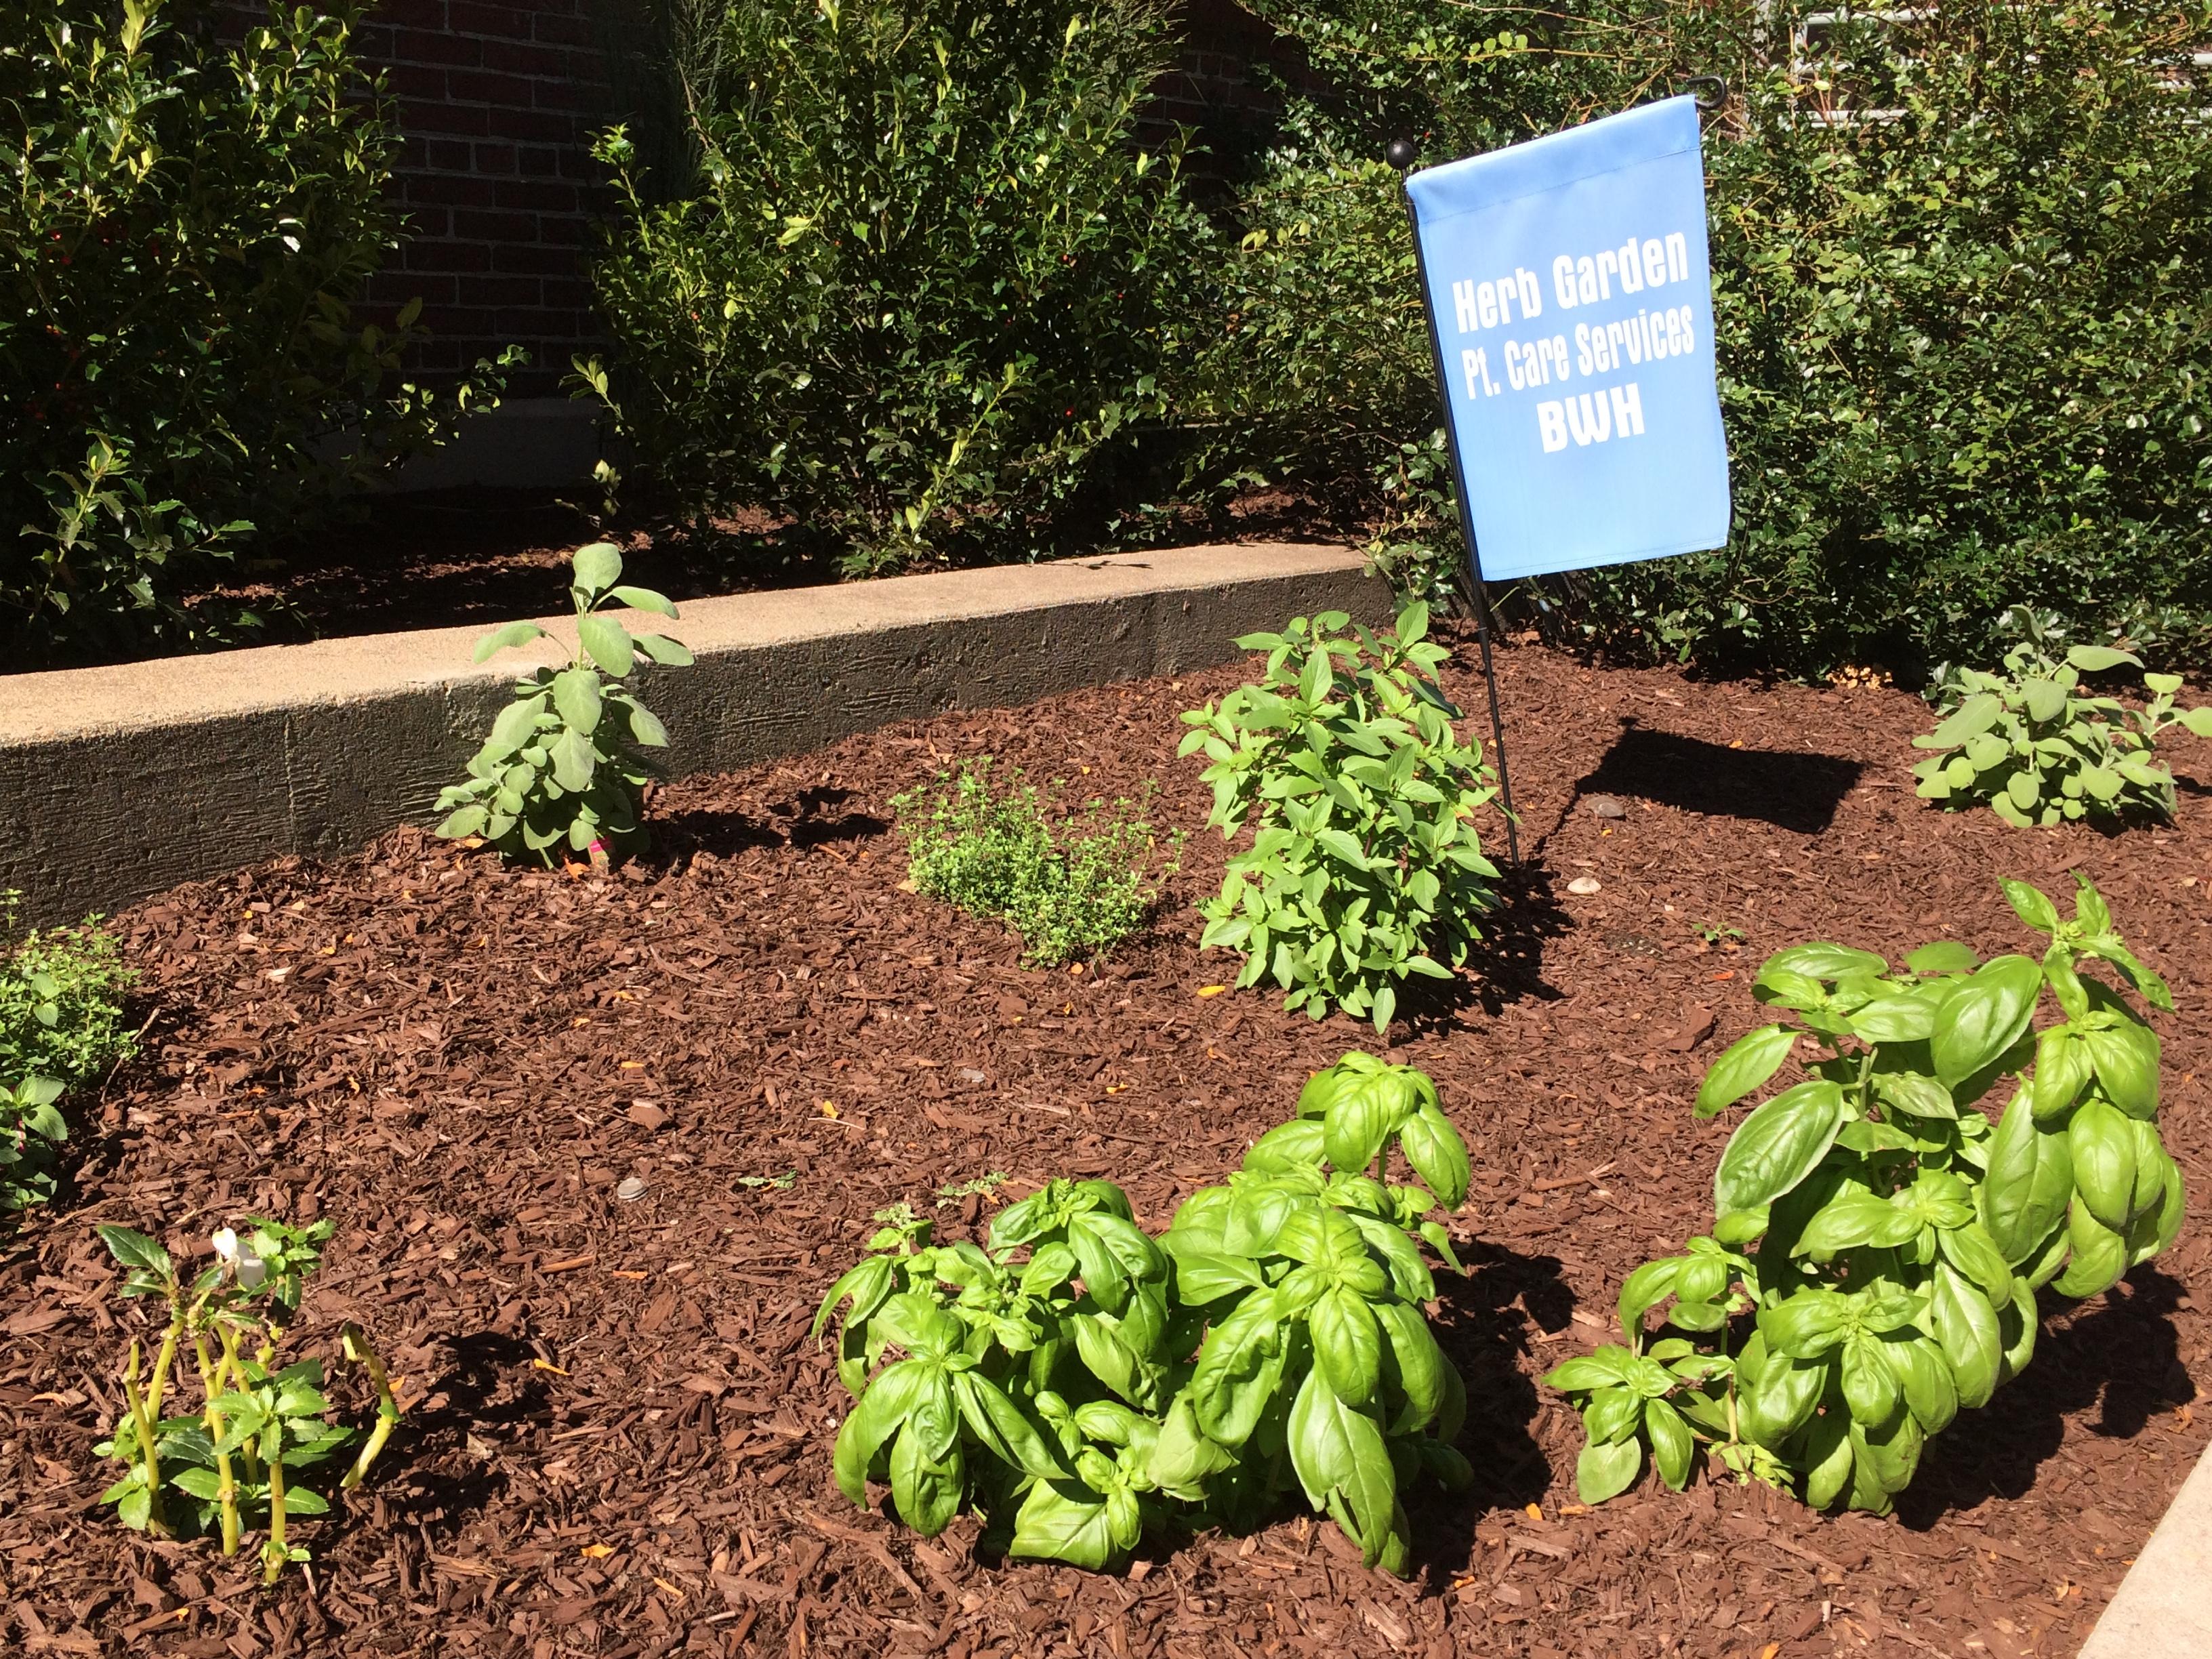 The herb garden on Shattuck Street